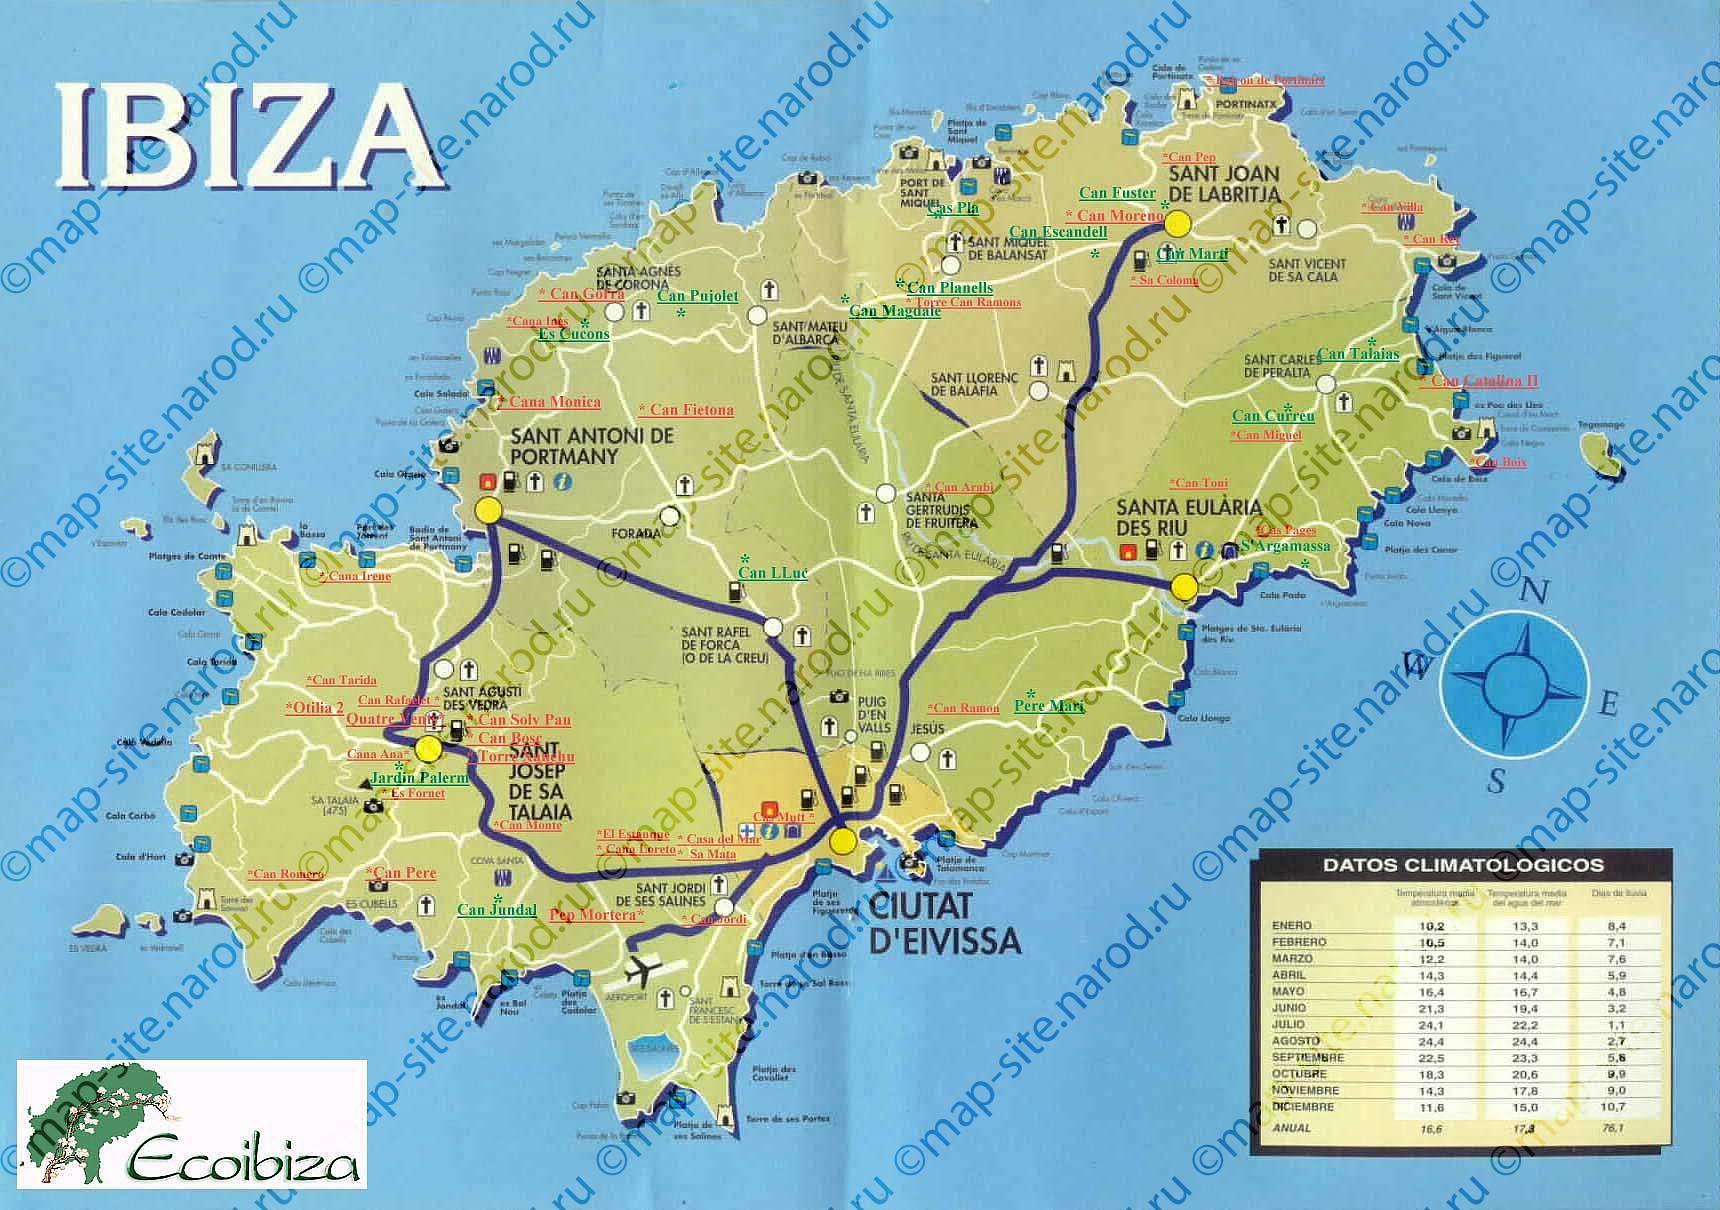 ibiza map ibiza resorts map ibiza resorts map ibiza resorts maphtml